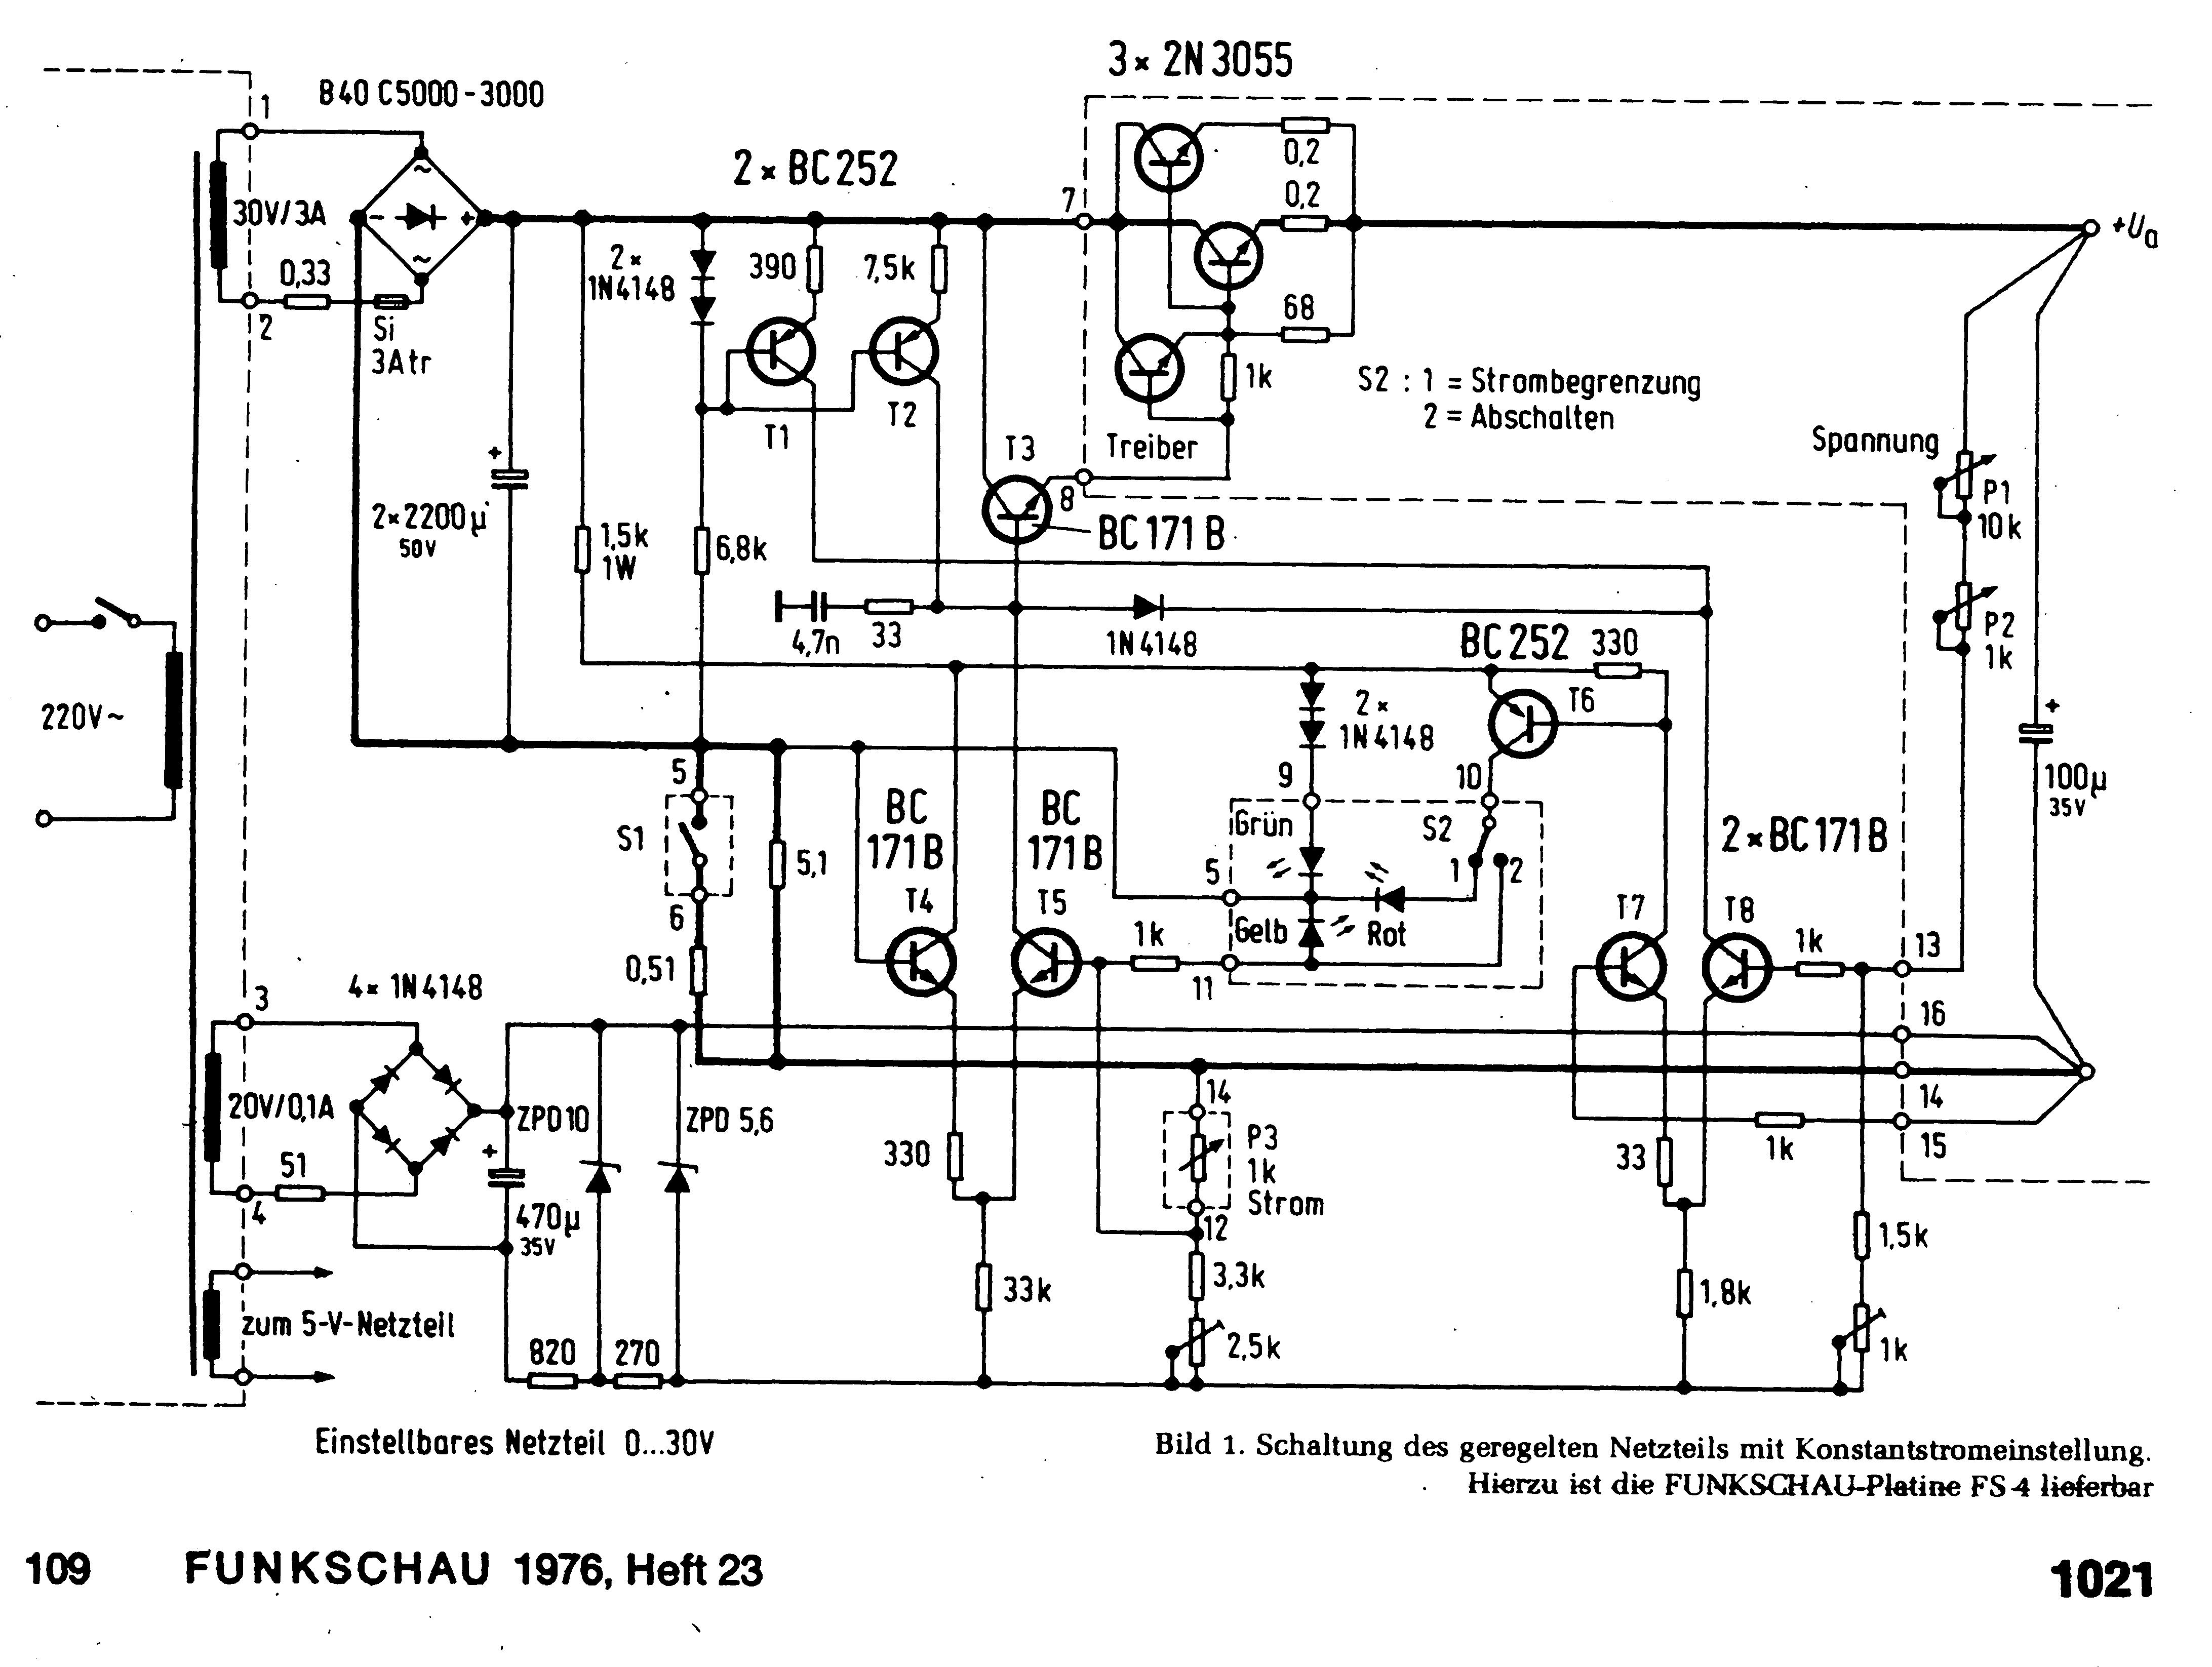 labornetzteil funkschau 1976 heft 23